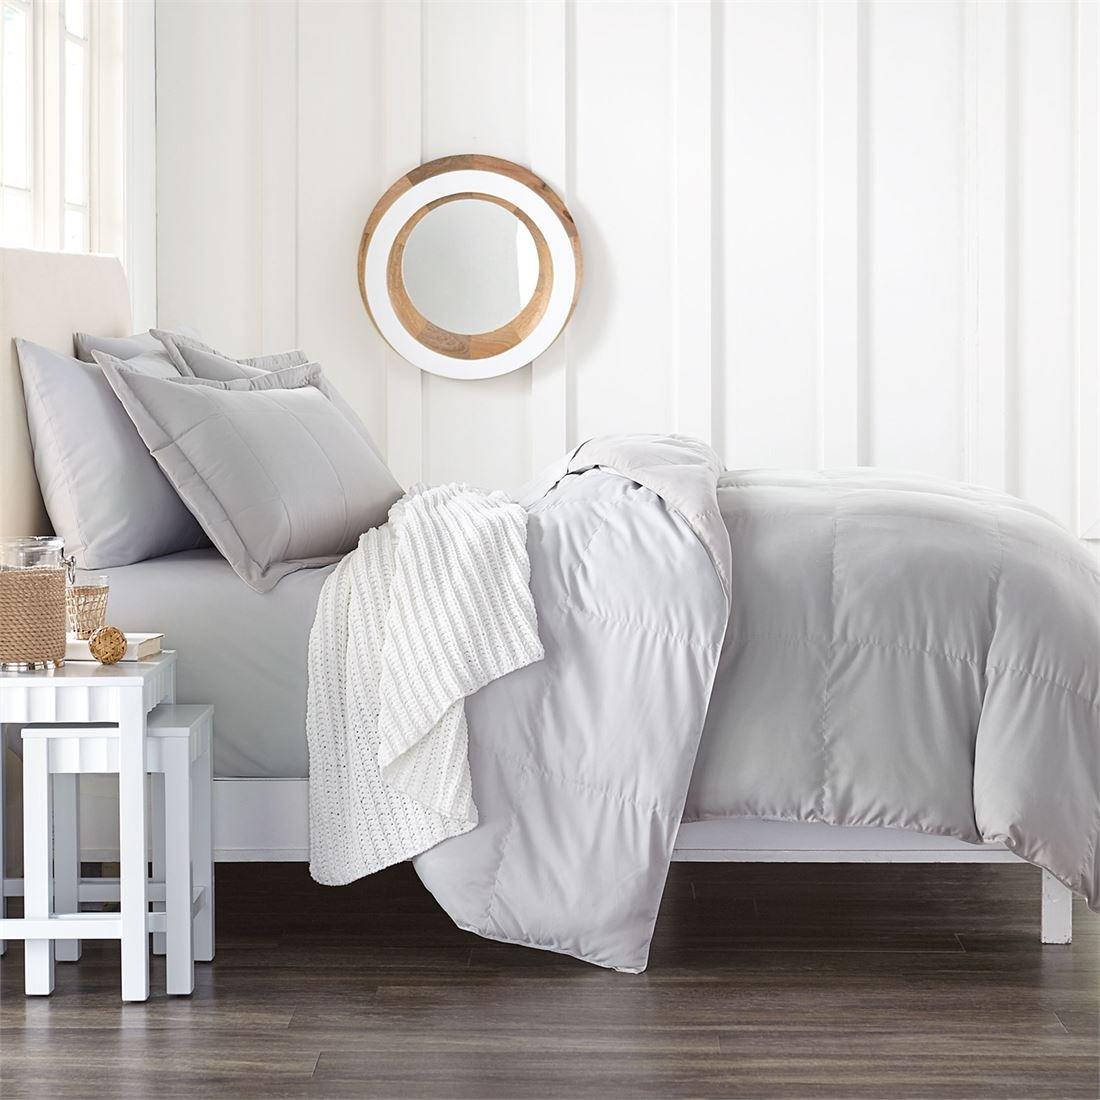 BrylaneHome Studio Reversible Baffle Box Comforter (Gray Silver,Full)